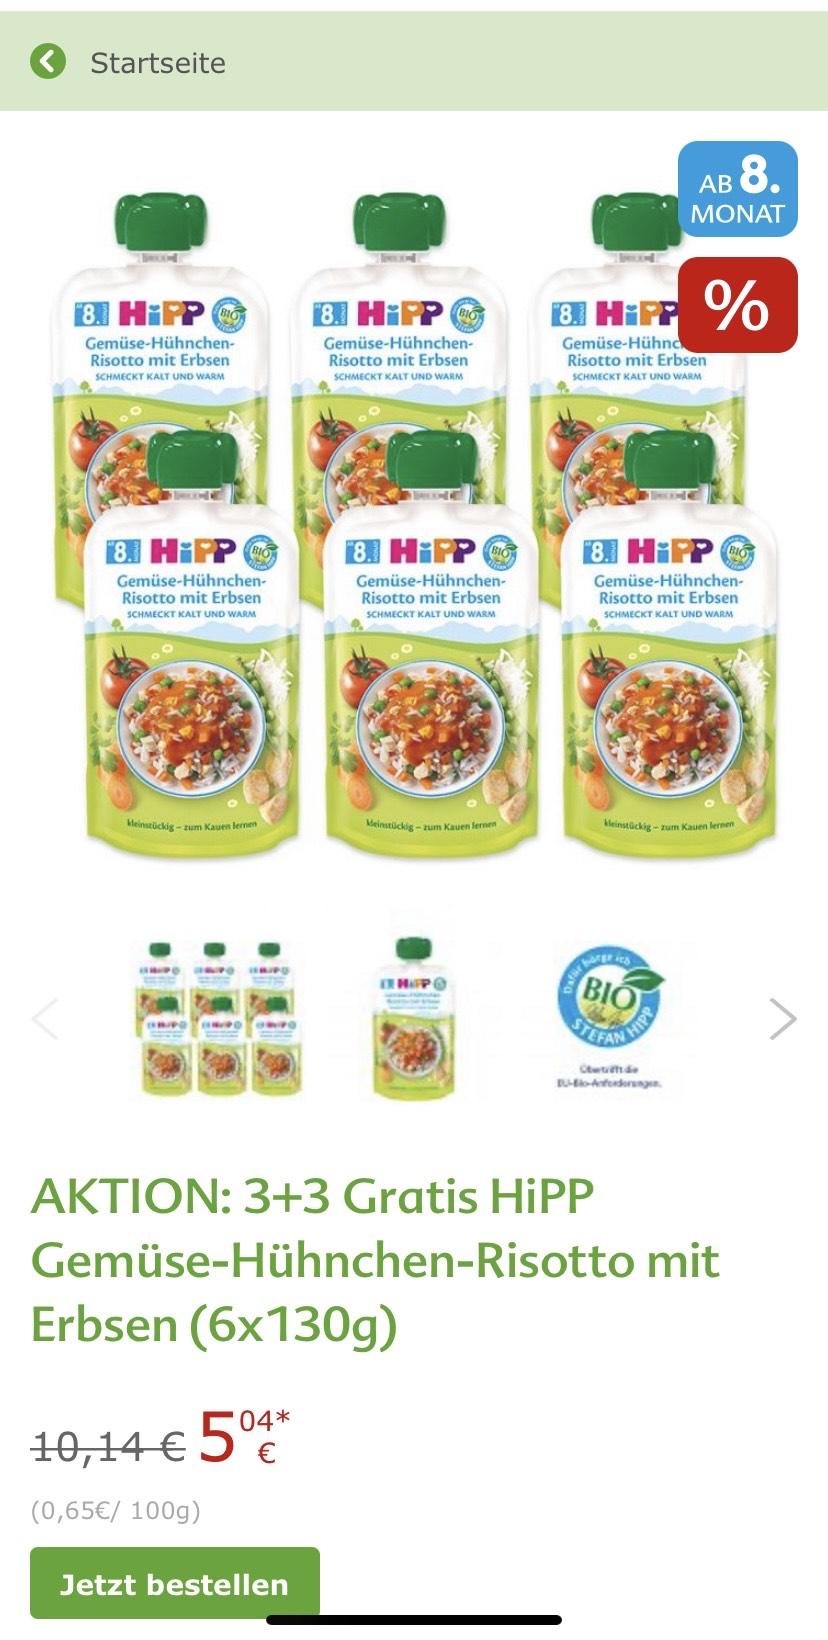 Hipp Herzhafte Quetschies, z.B. HiPP Spaghetti Bolognese